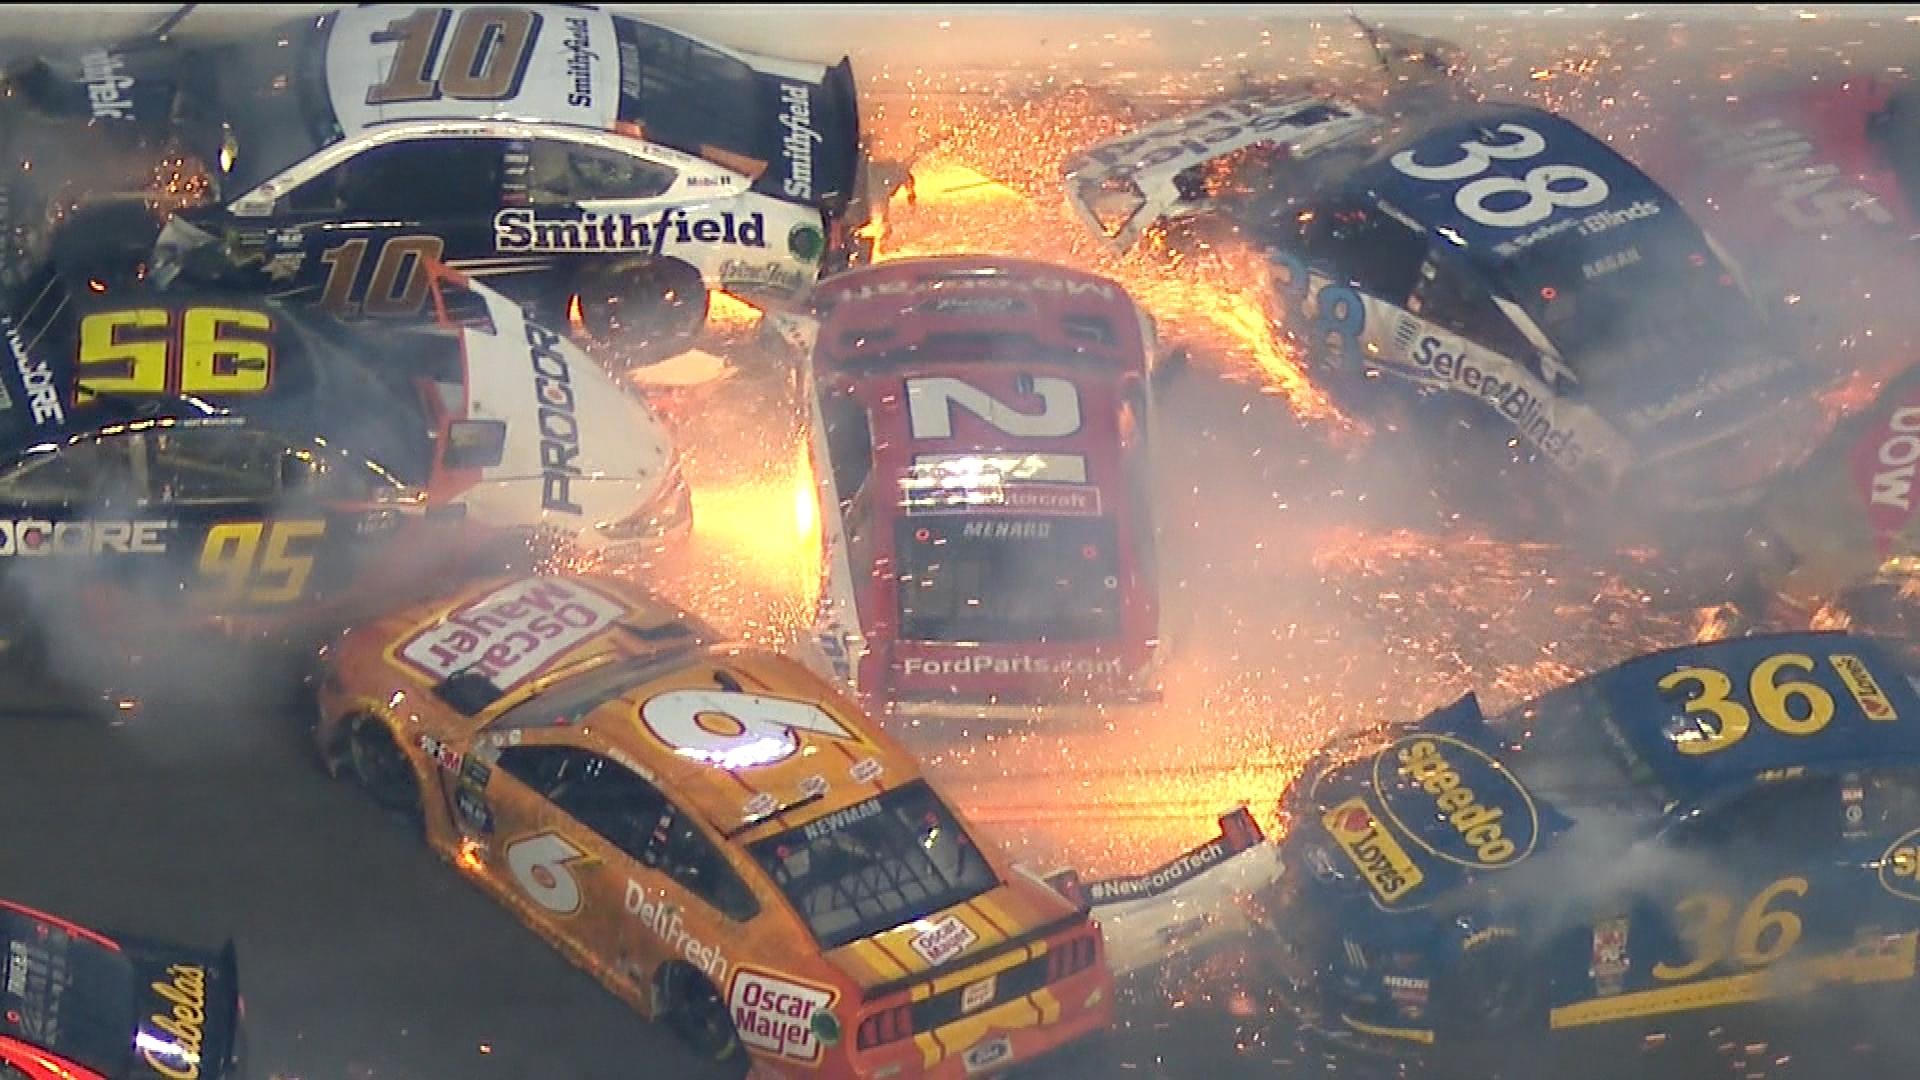 NASCAR Daytona 500 crash knocks out half the field NBC Sports 1920x1080